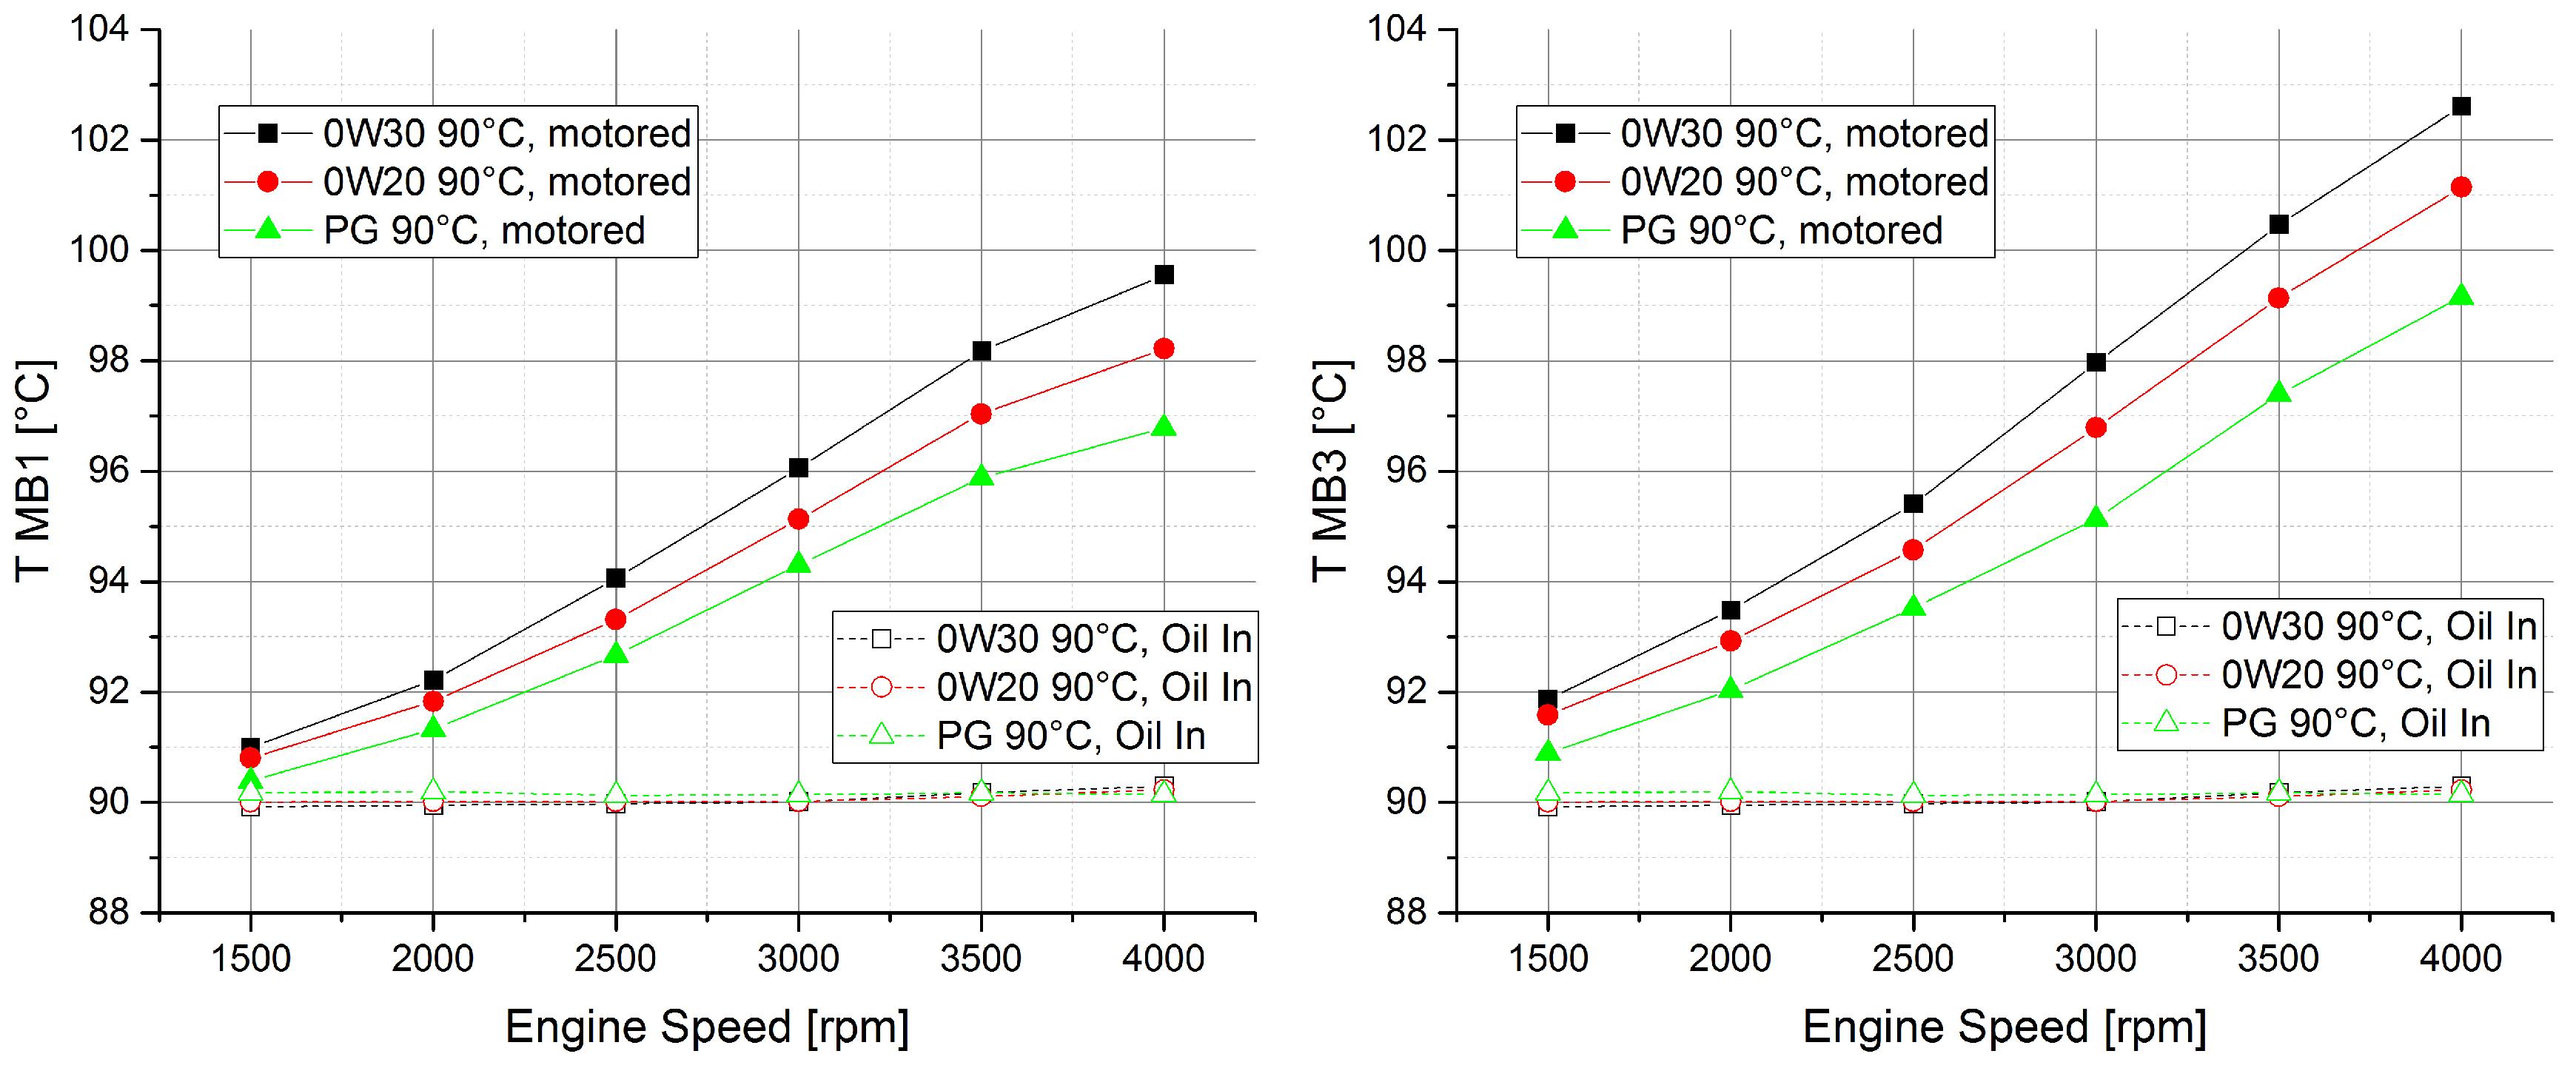 5w20 Vs 5w30 >> Motor Oil Viscosity Vs Rature Graph - Wallpaperzen.org